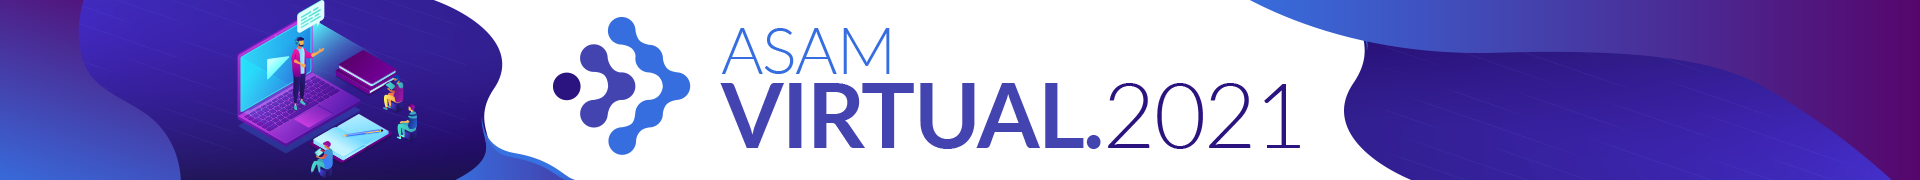 ASAM Virtual 2021 Event Banner